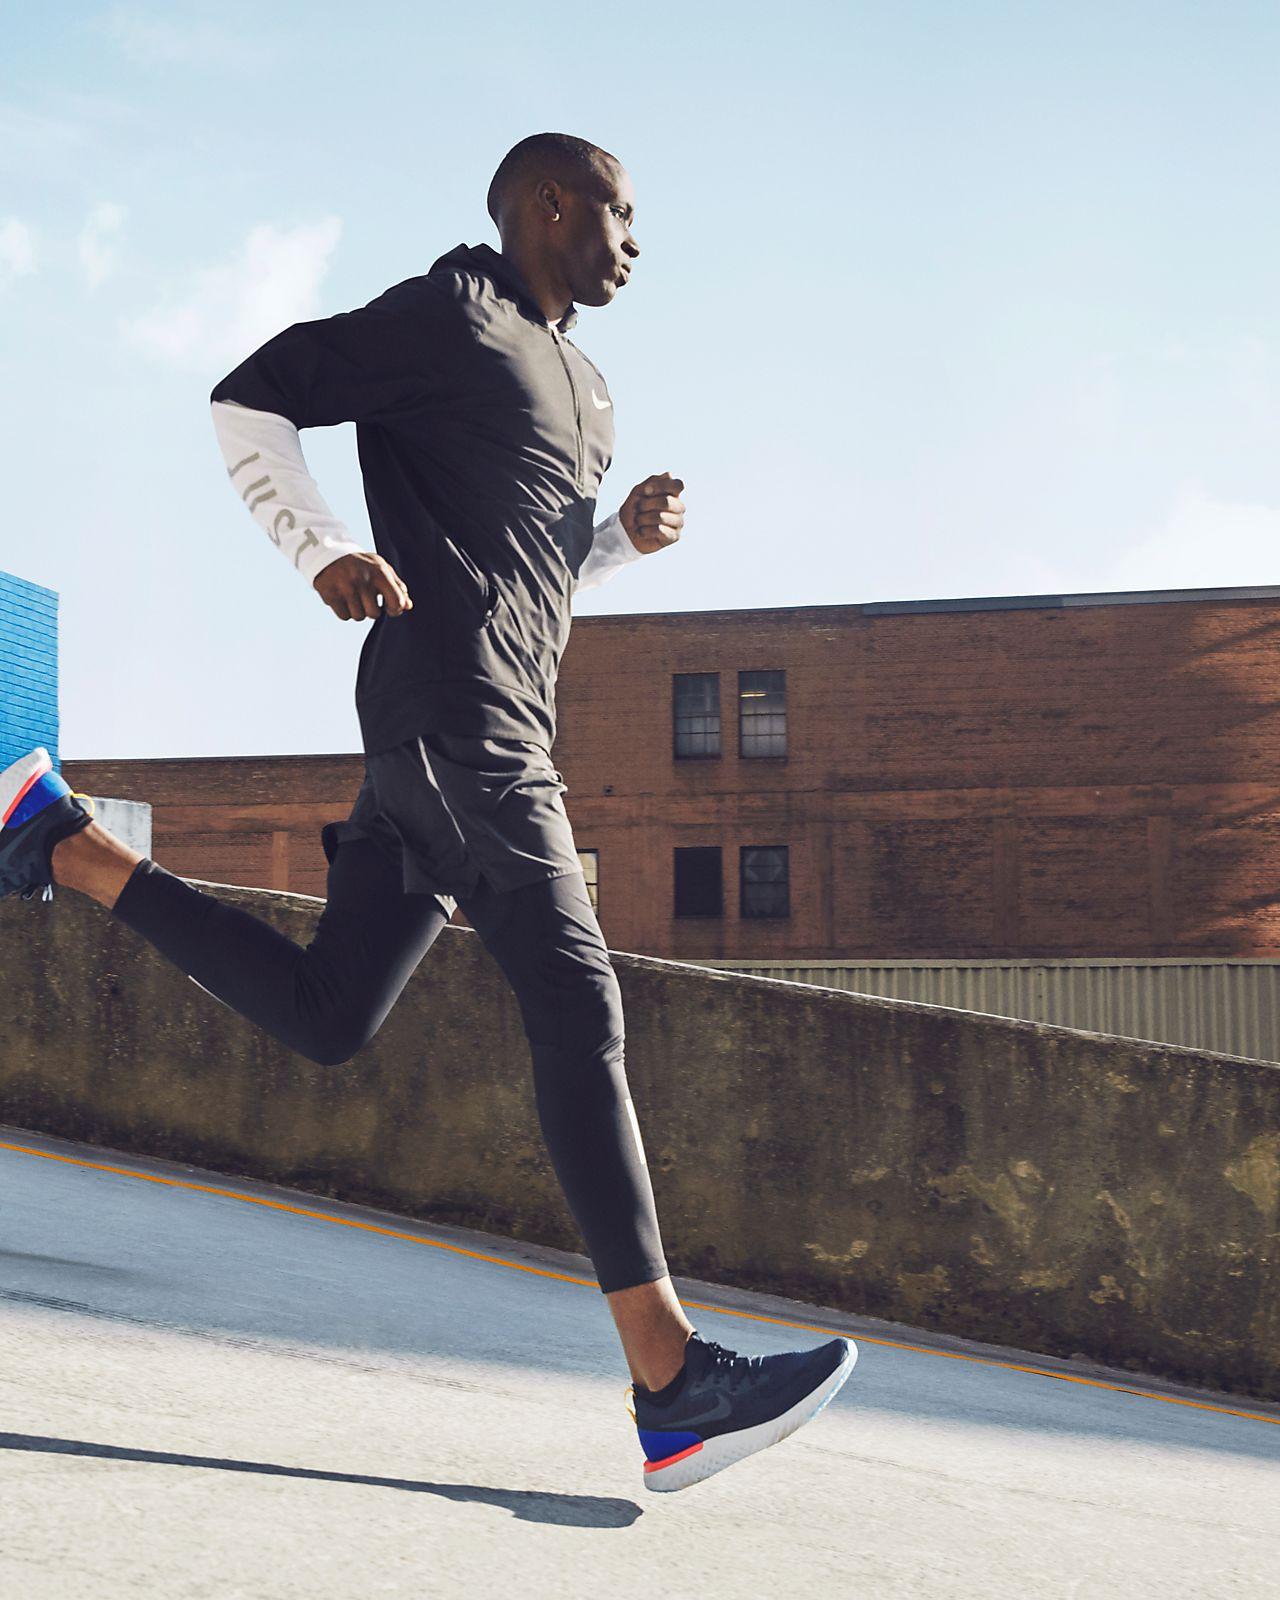 ... Nike Epic React Flyknit Herren-Laufschuh